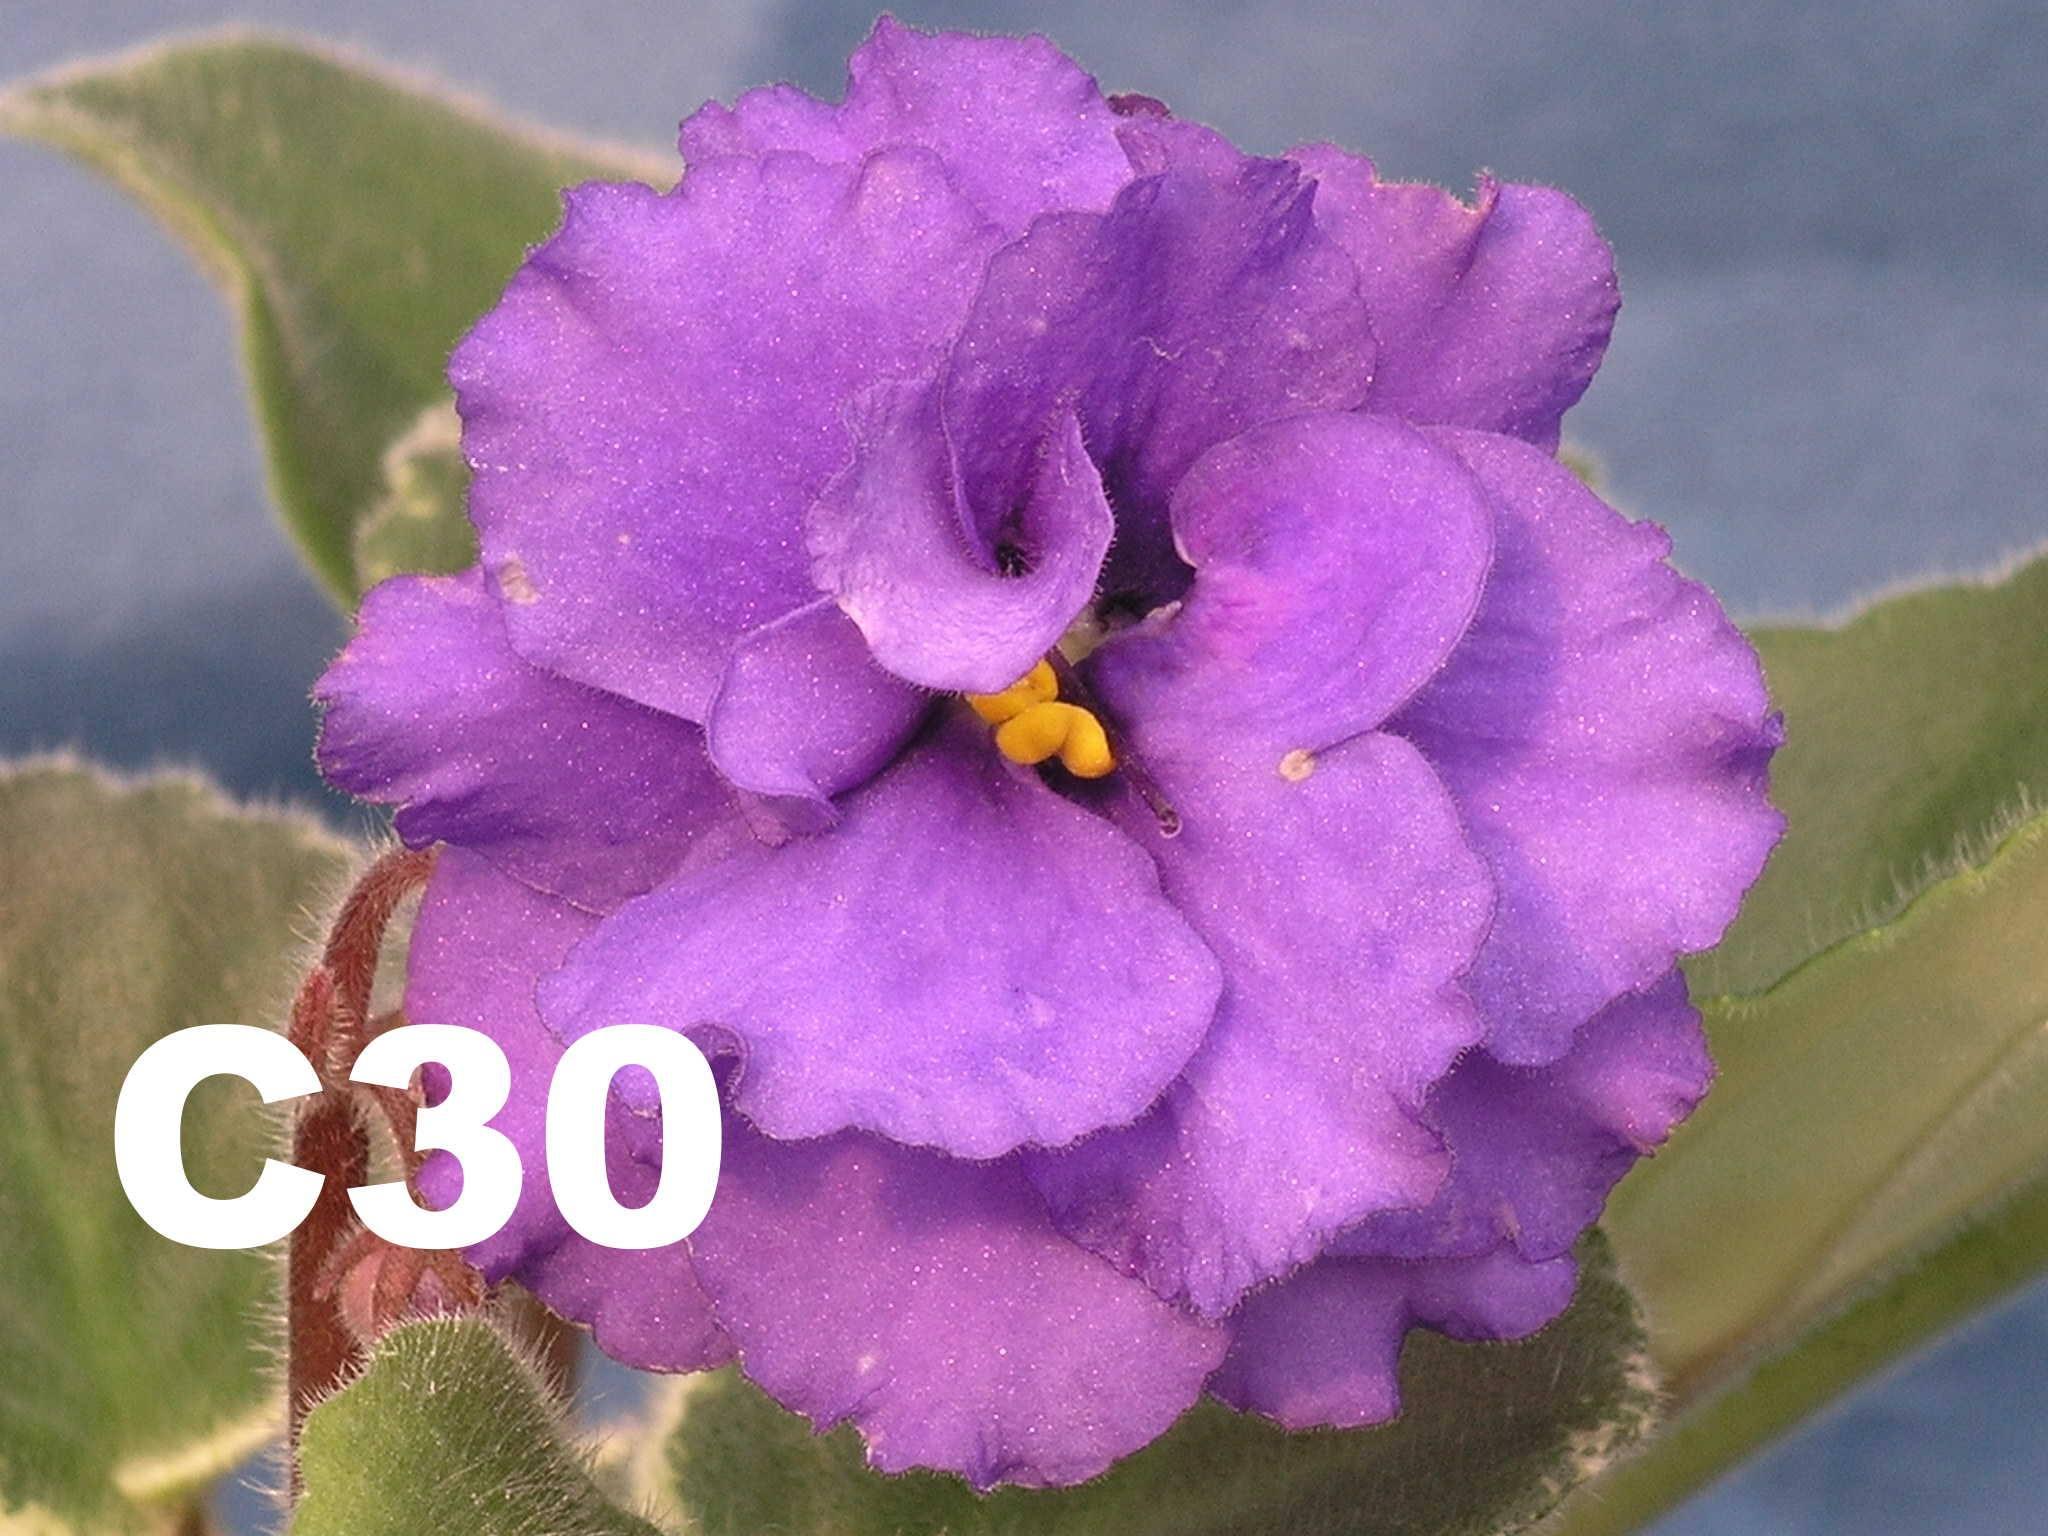 非洲紫羅蘭名錄 | African Violets Catalogue - C系列 C30